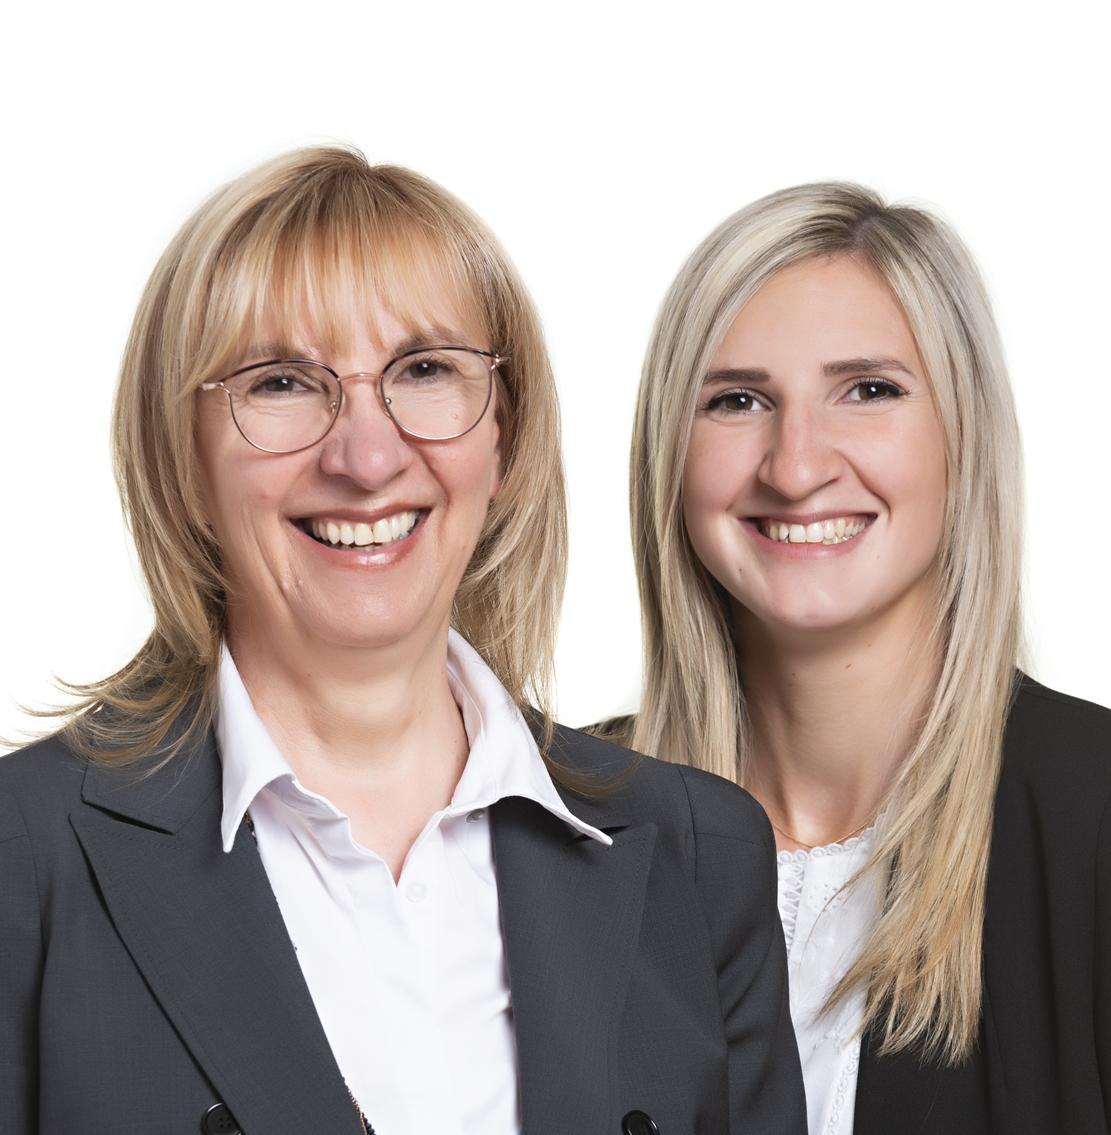 L'equipe immobiliere Soly et compagnie de Proprio Direct, Louise Soly et Rose-Marie Cyr